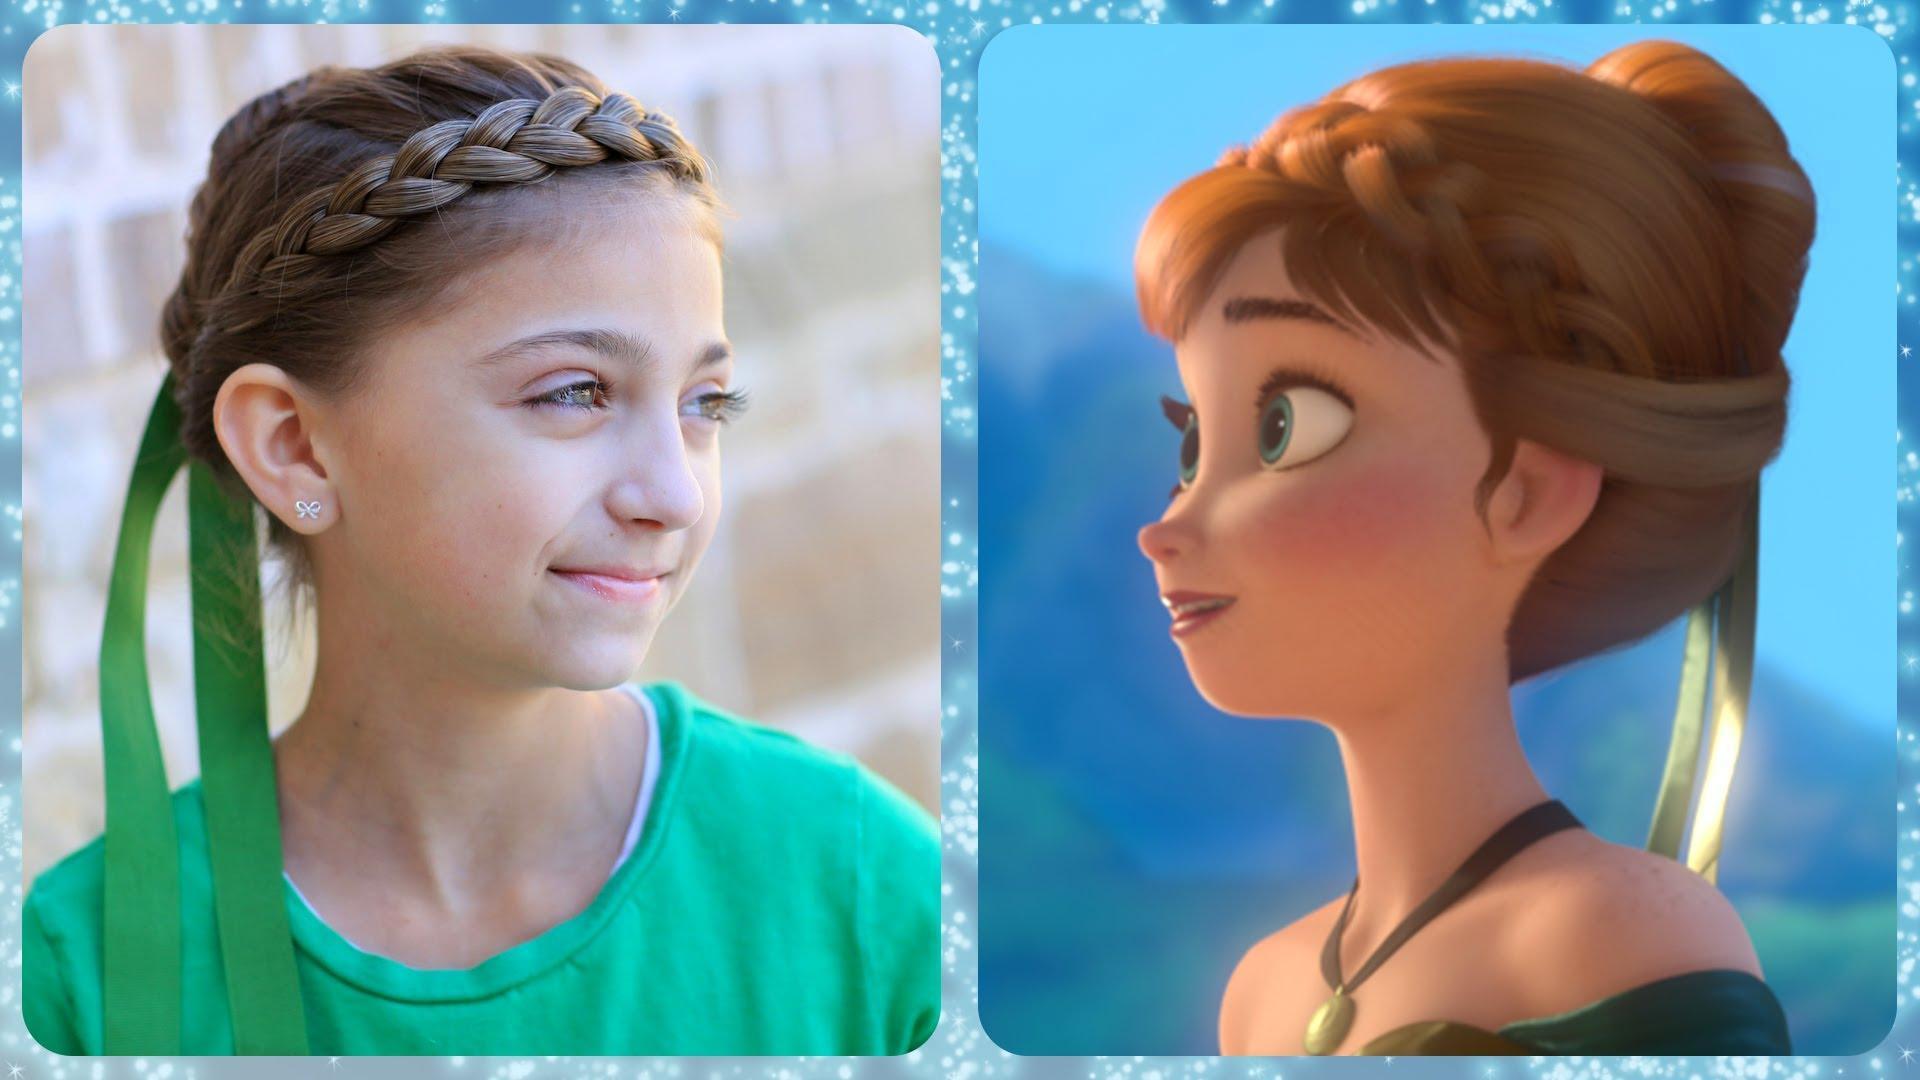 Frozen Inspired Anna's Coronation Hairstyle Tutorial – A Cutegirlshairstyles Disney Exclusive